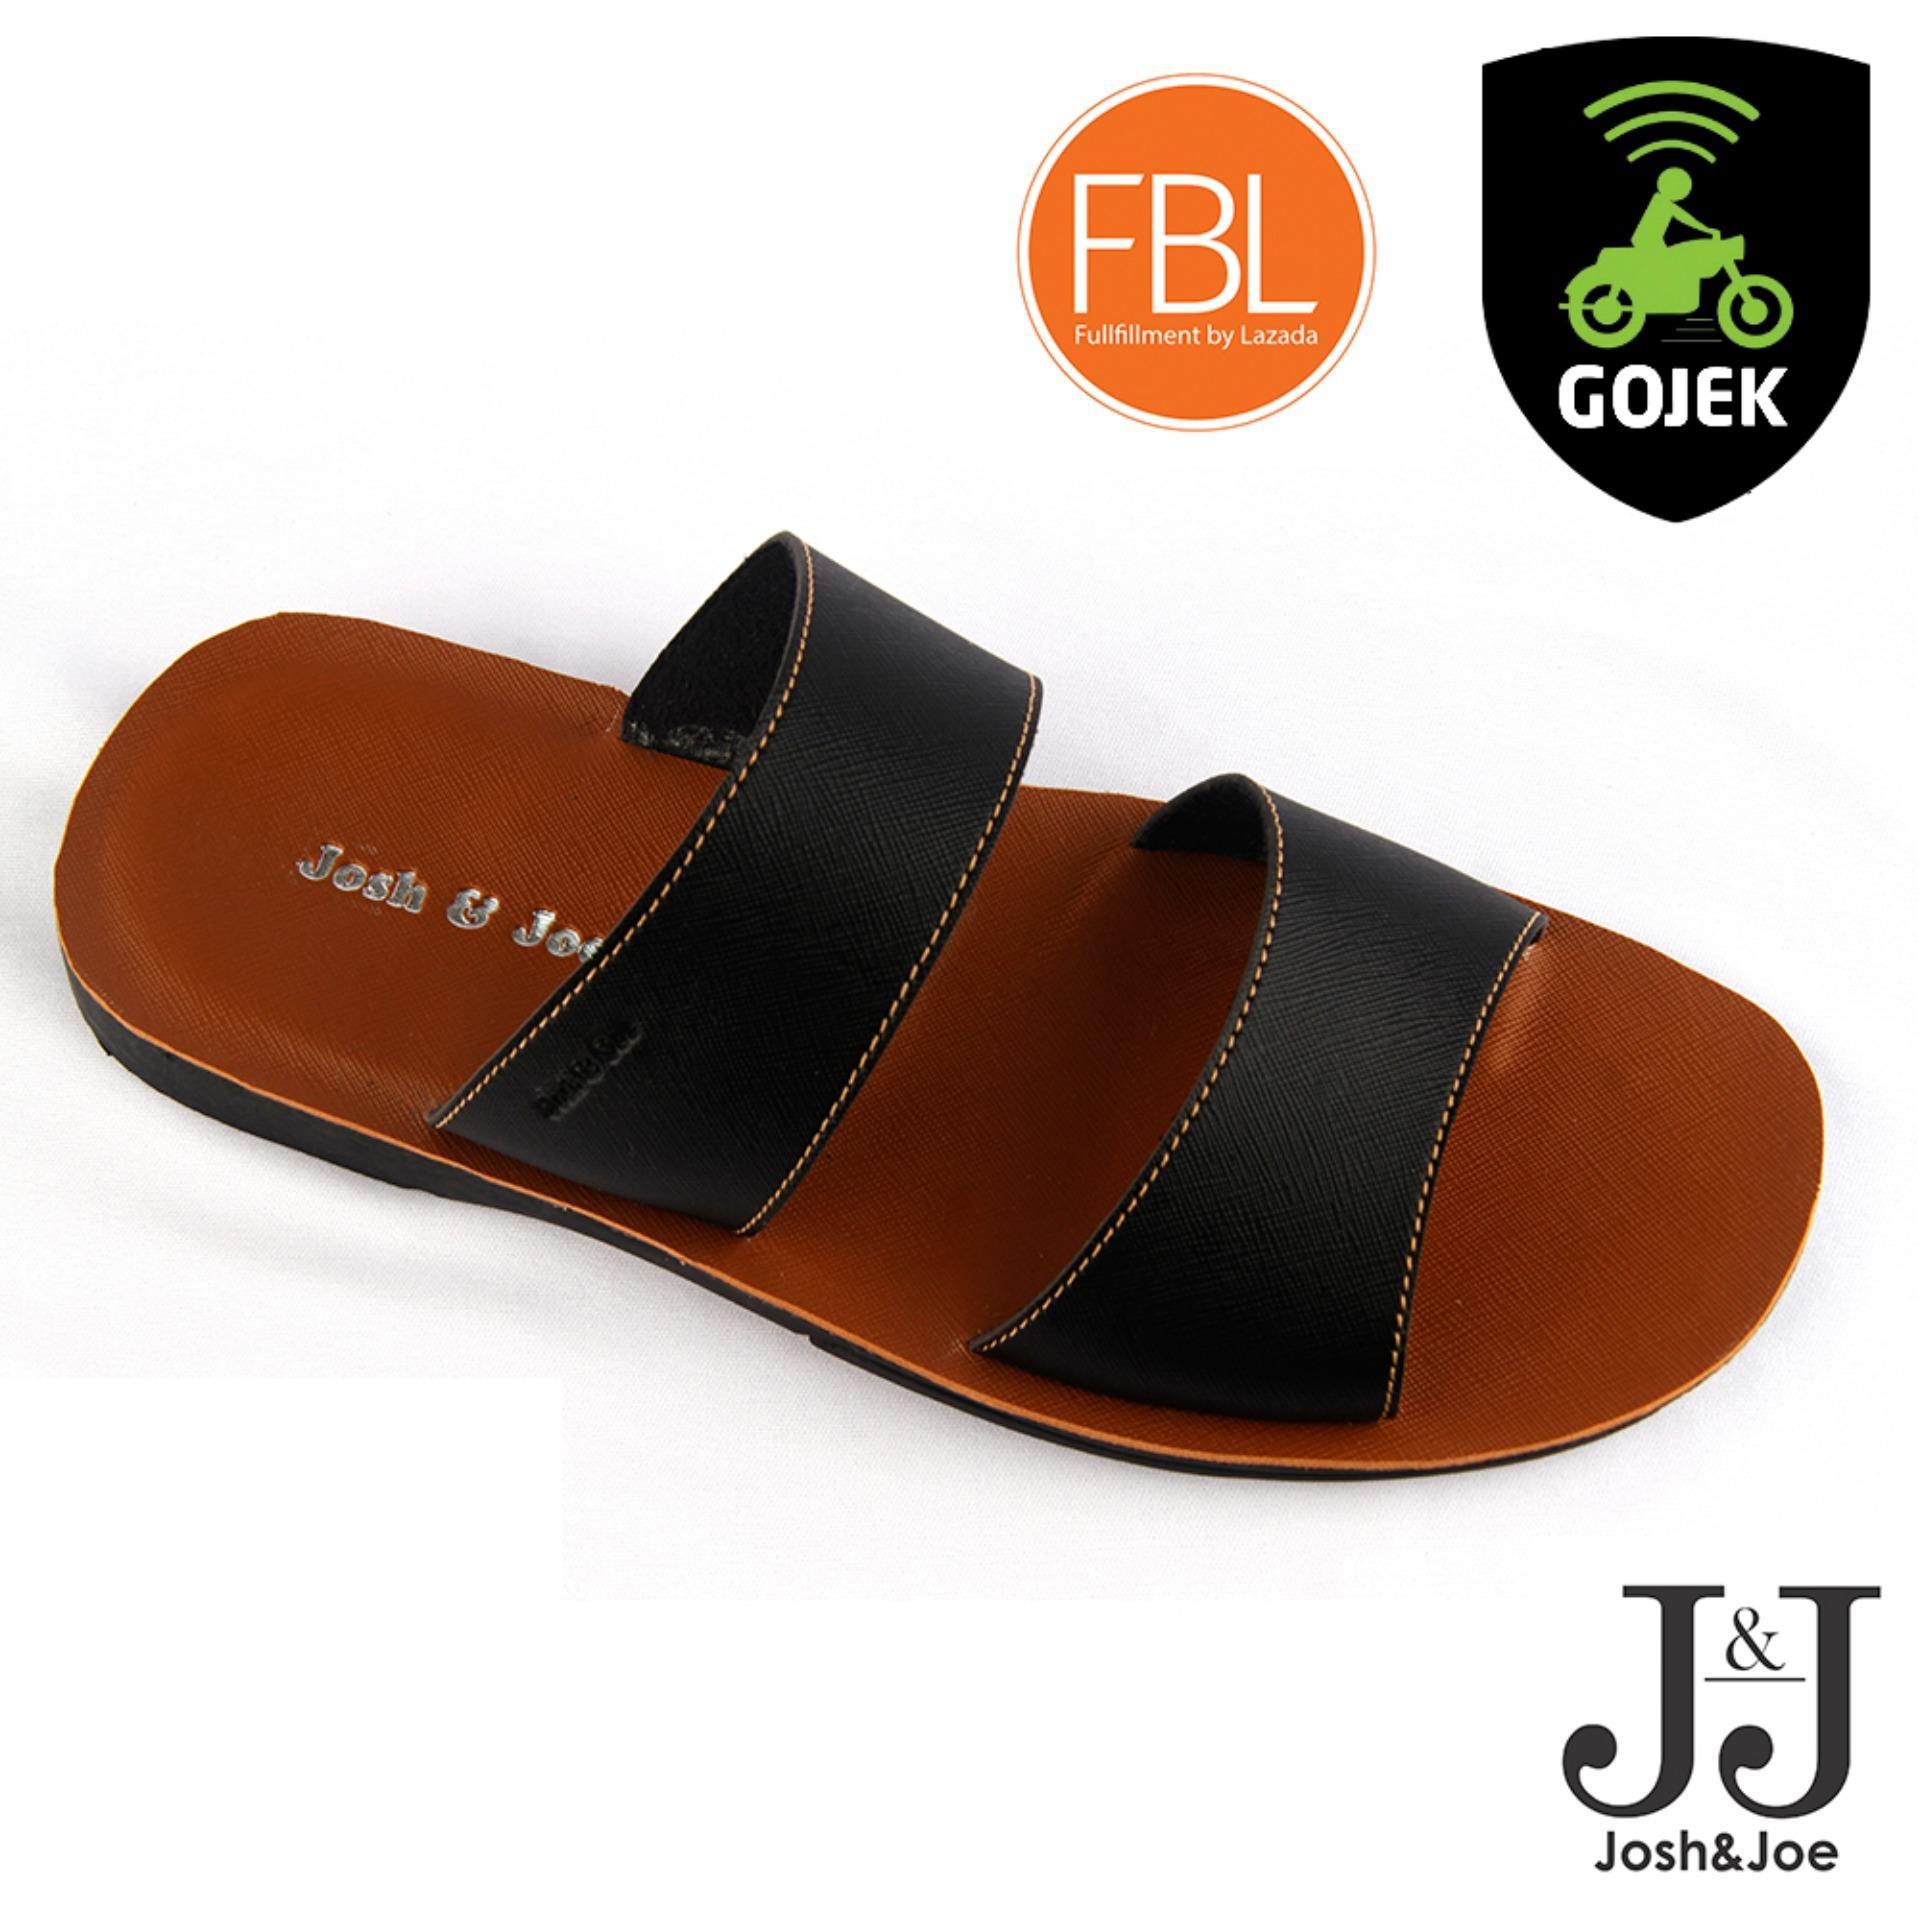 Katalog Josh Joe Fashion Pria Sandal Murah Sandal Pria Sandal Pria Kulit Sandal Pria Casual Sandal Pria Dewasa Sandal Gunung Pria Sandal Jepit Pria 07Ht Terbaru